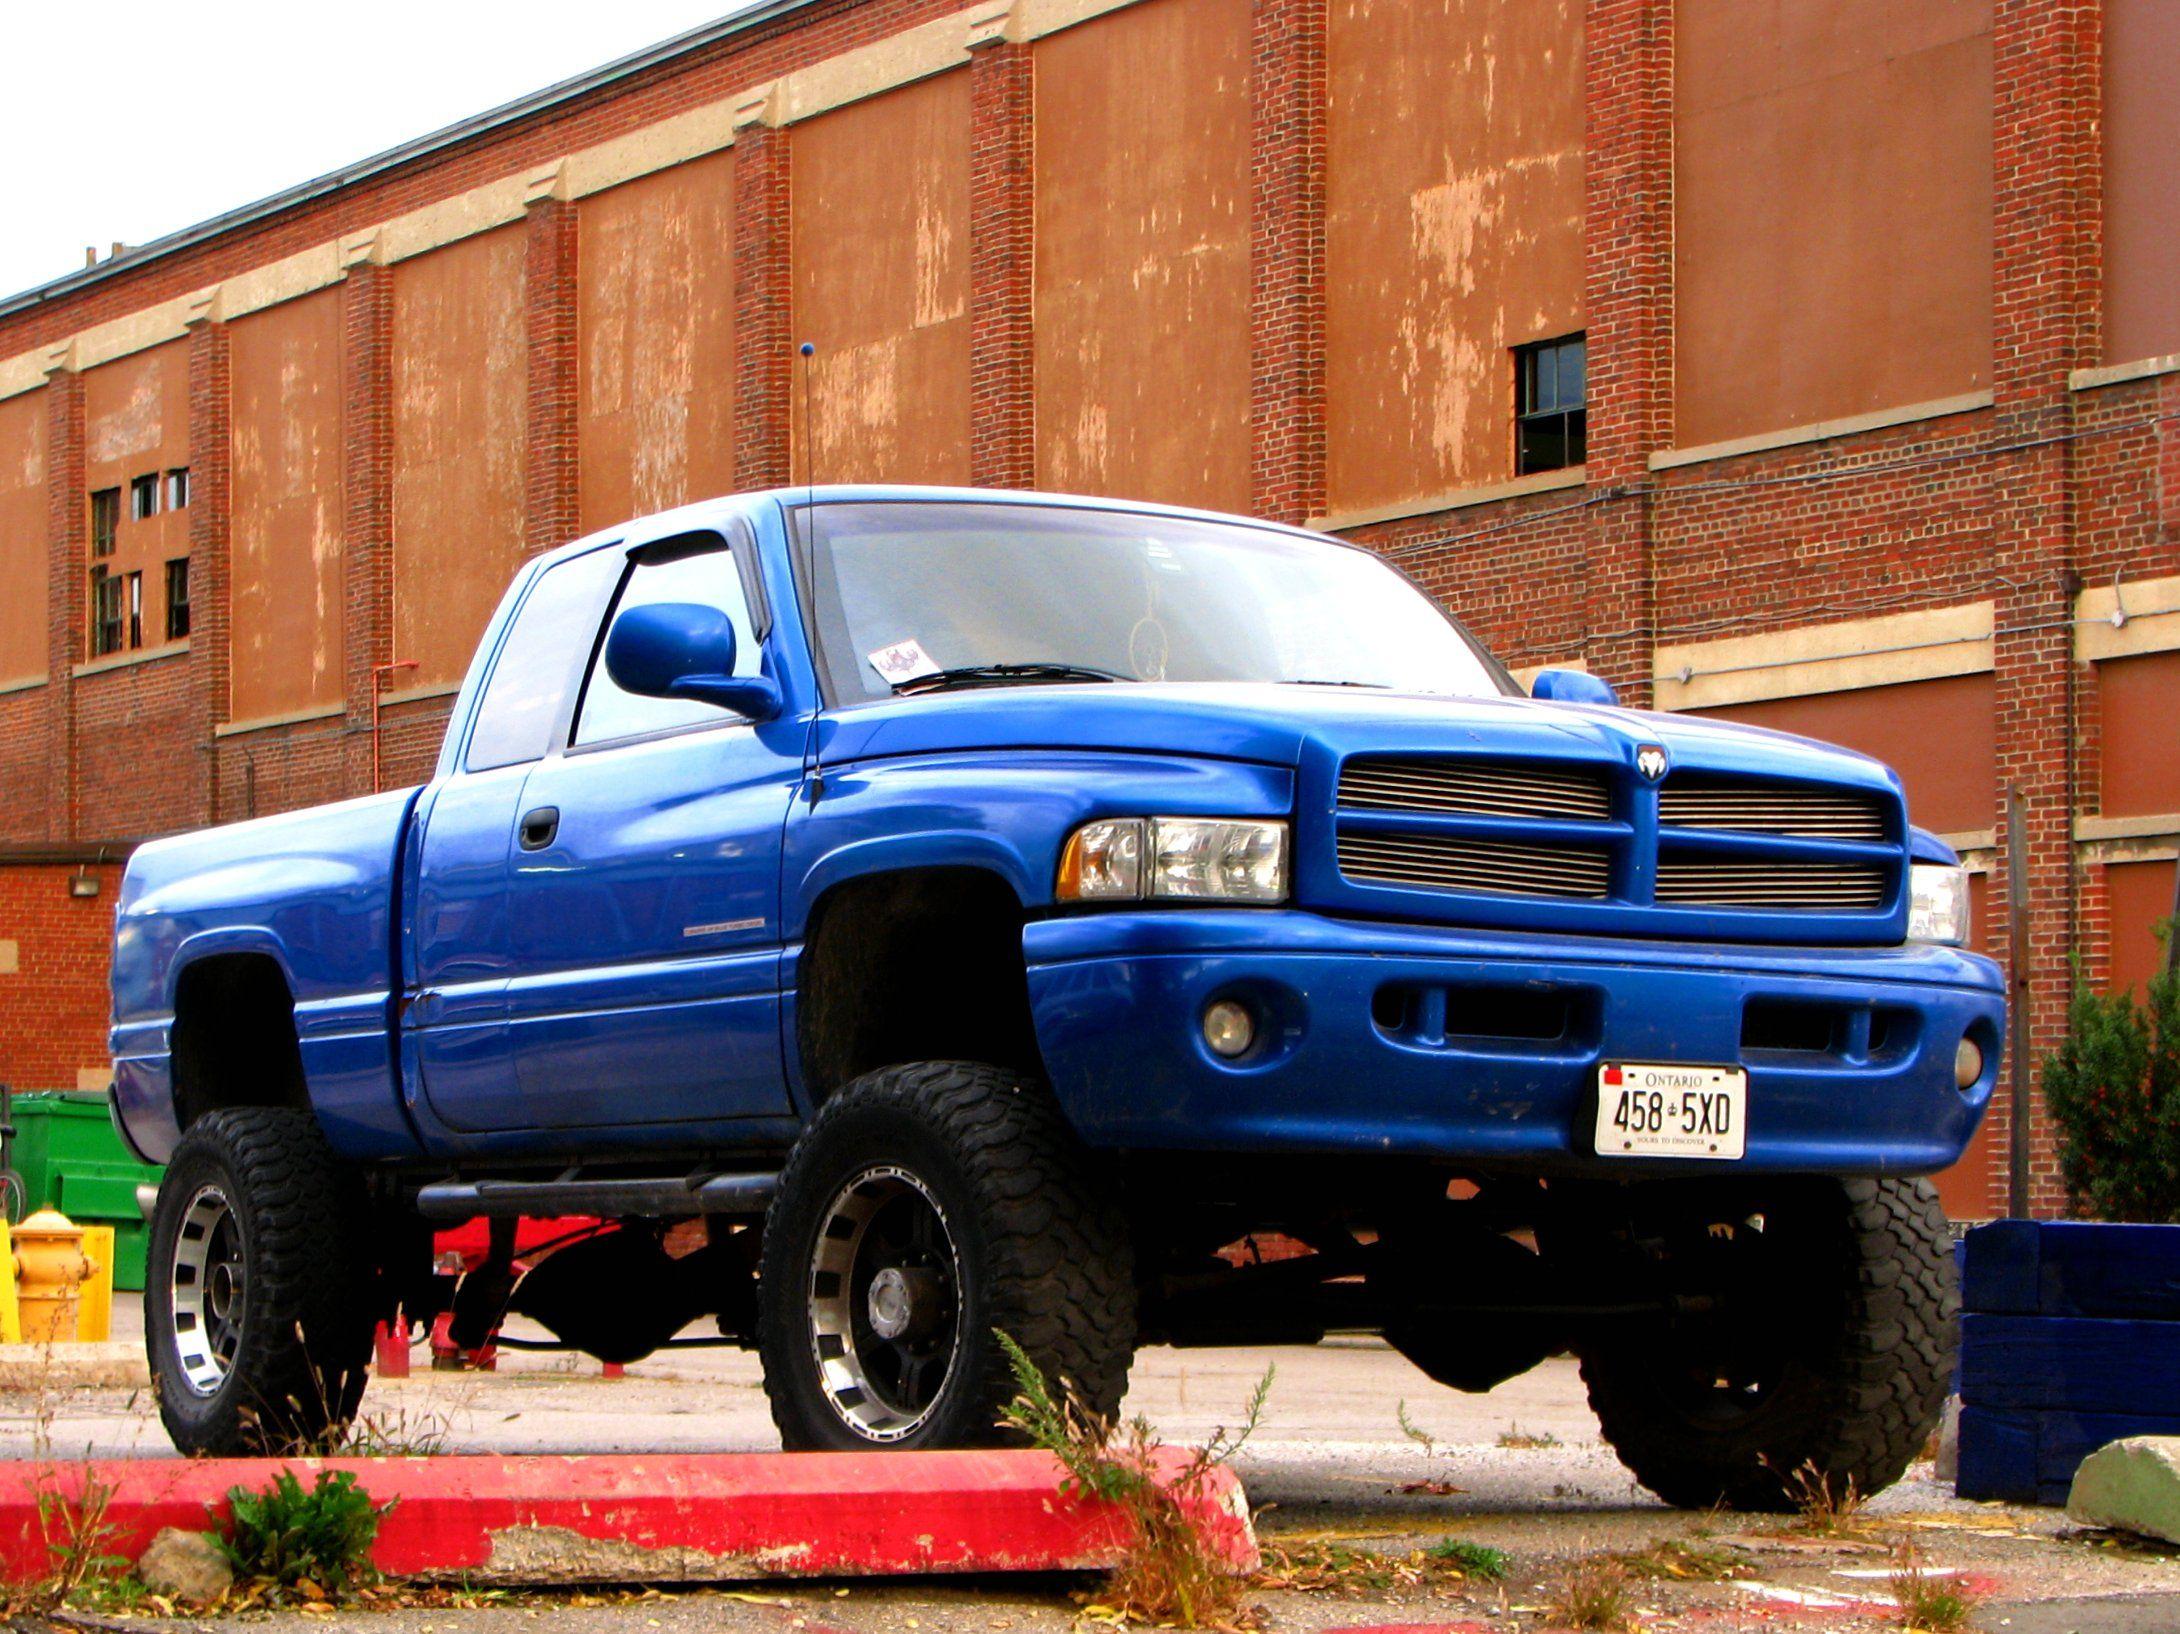 Moritz Chrysler Jeep Dodge Ram 9101 Camp Bowie W Blvd 2 Fort